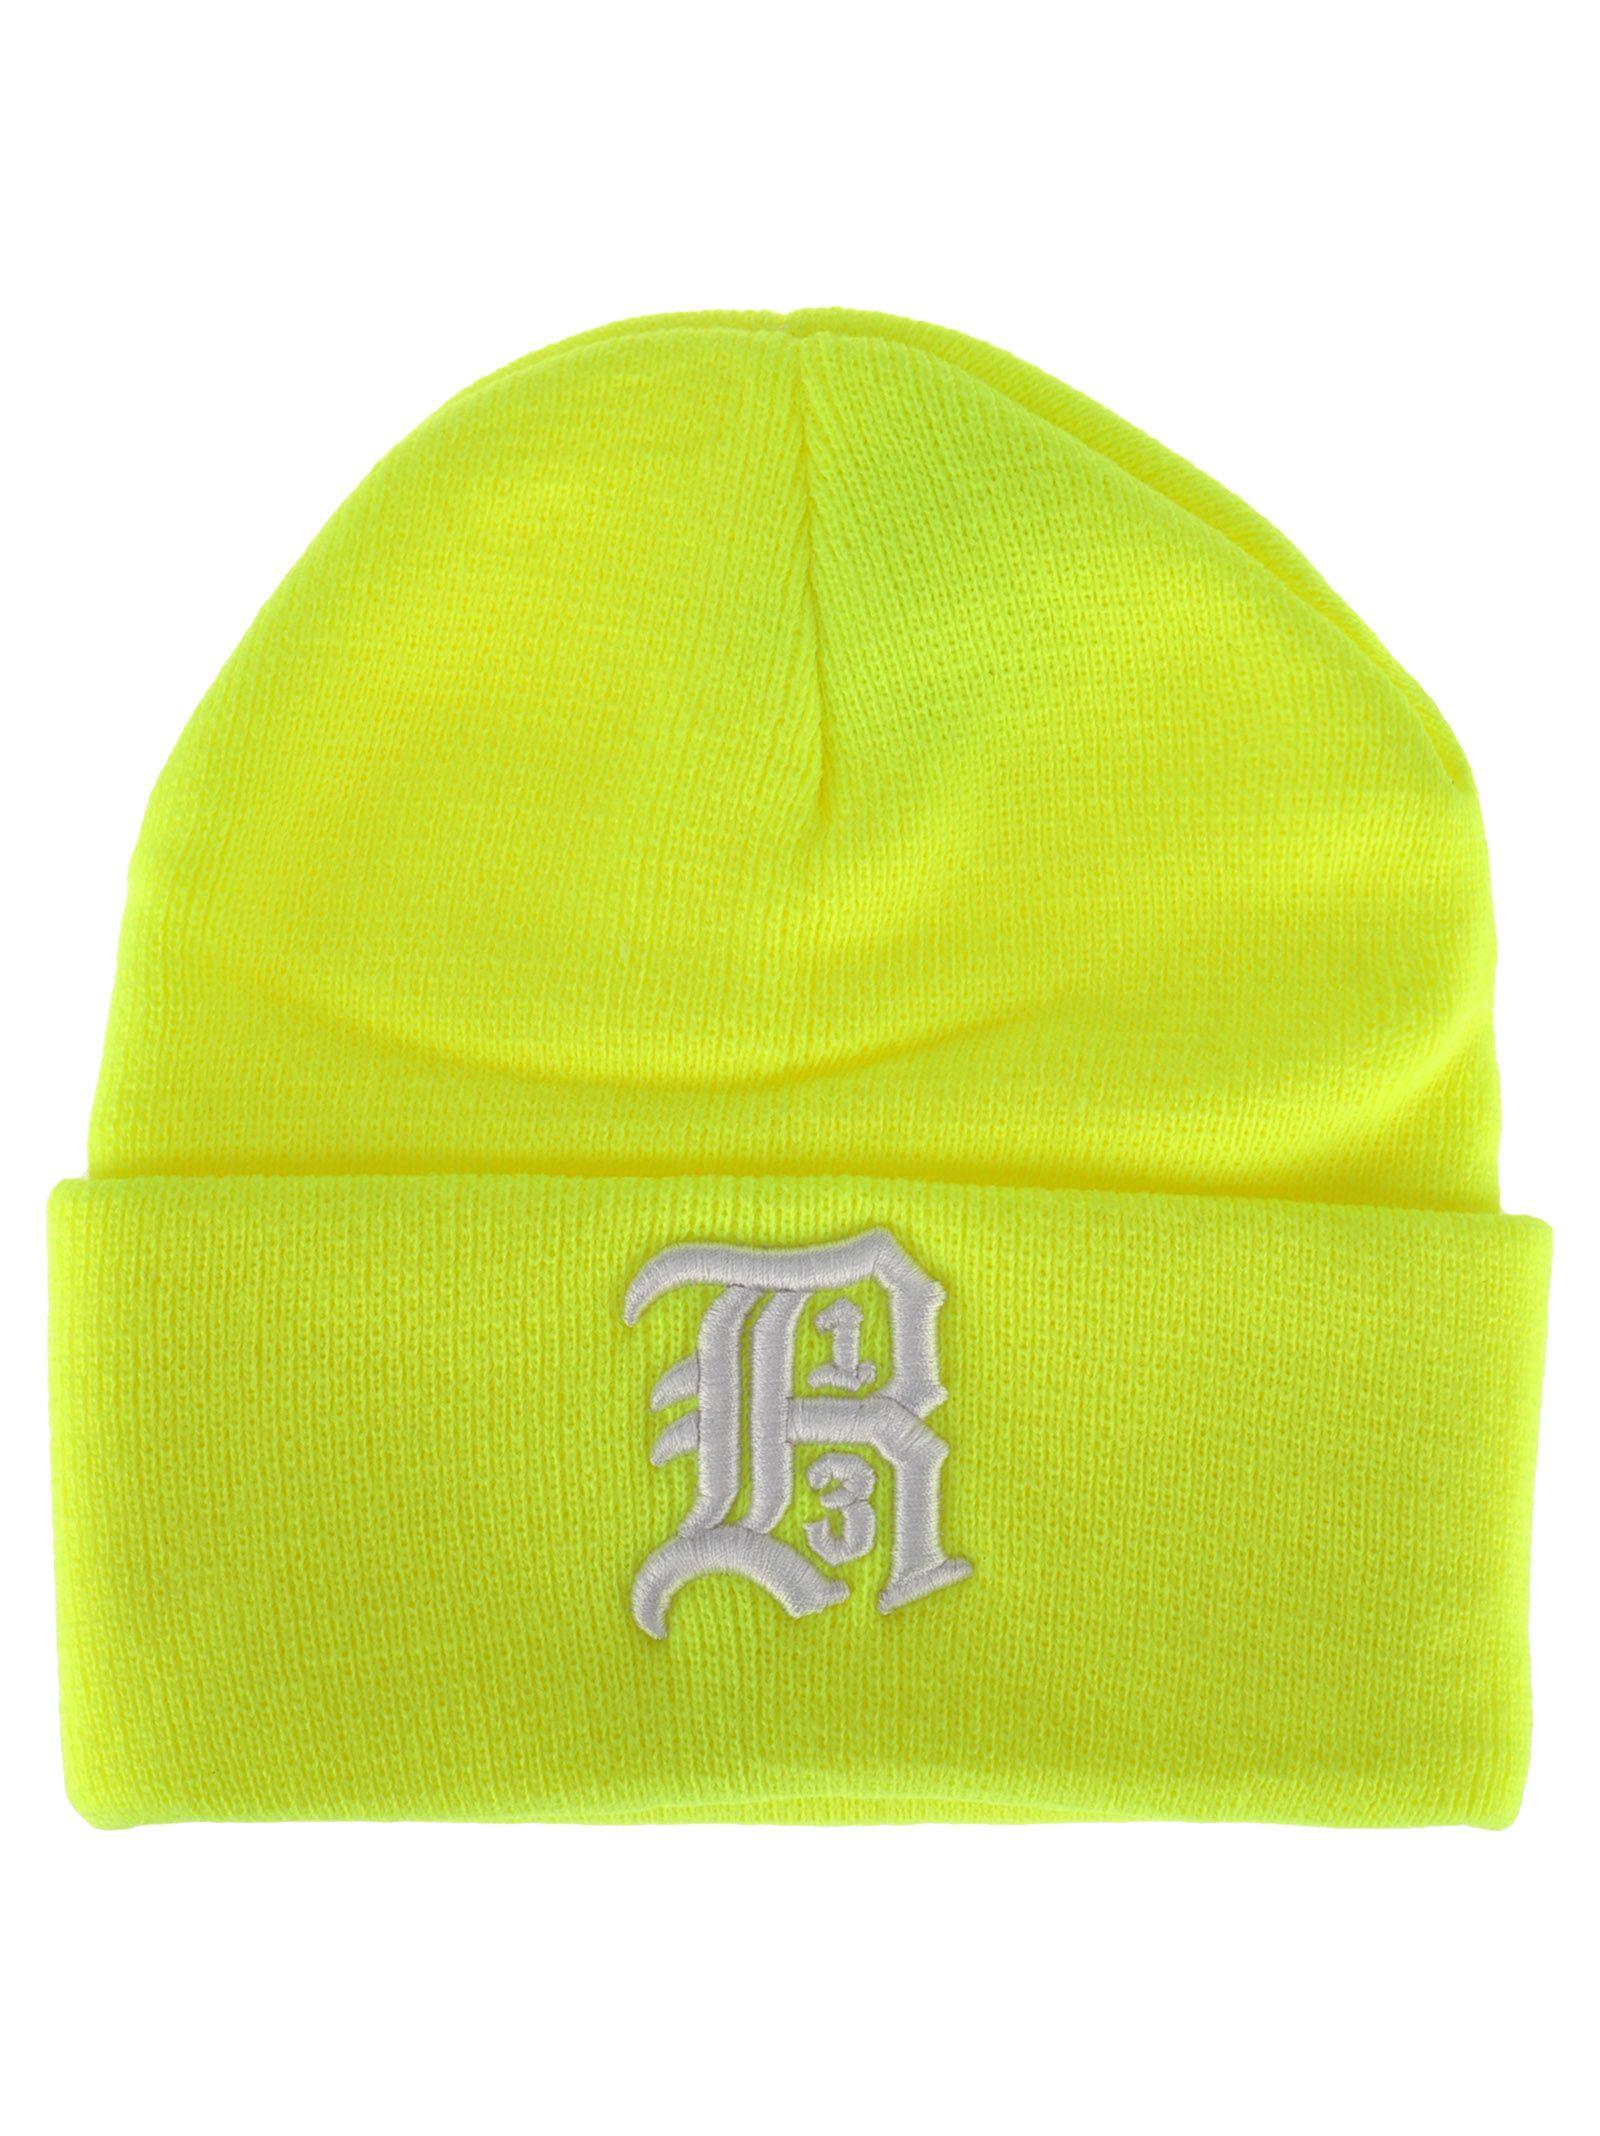 r13 -  Hat